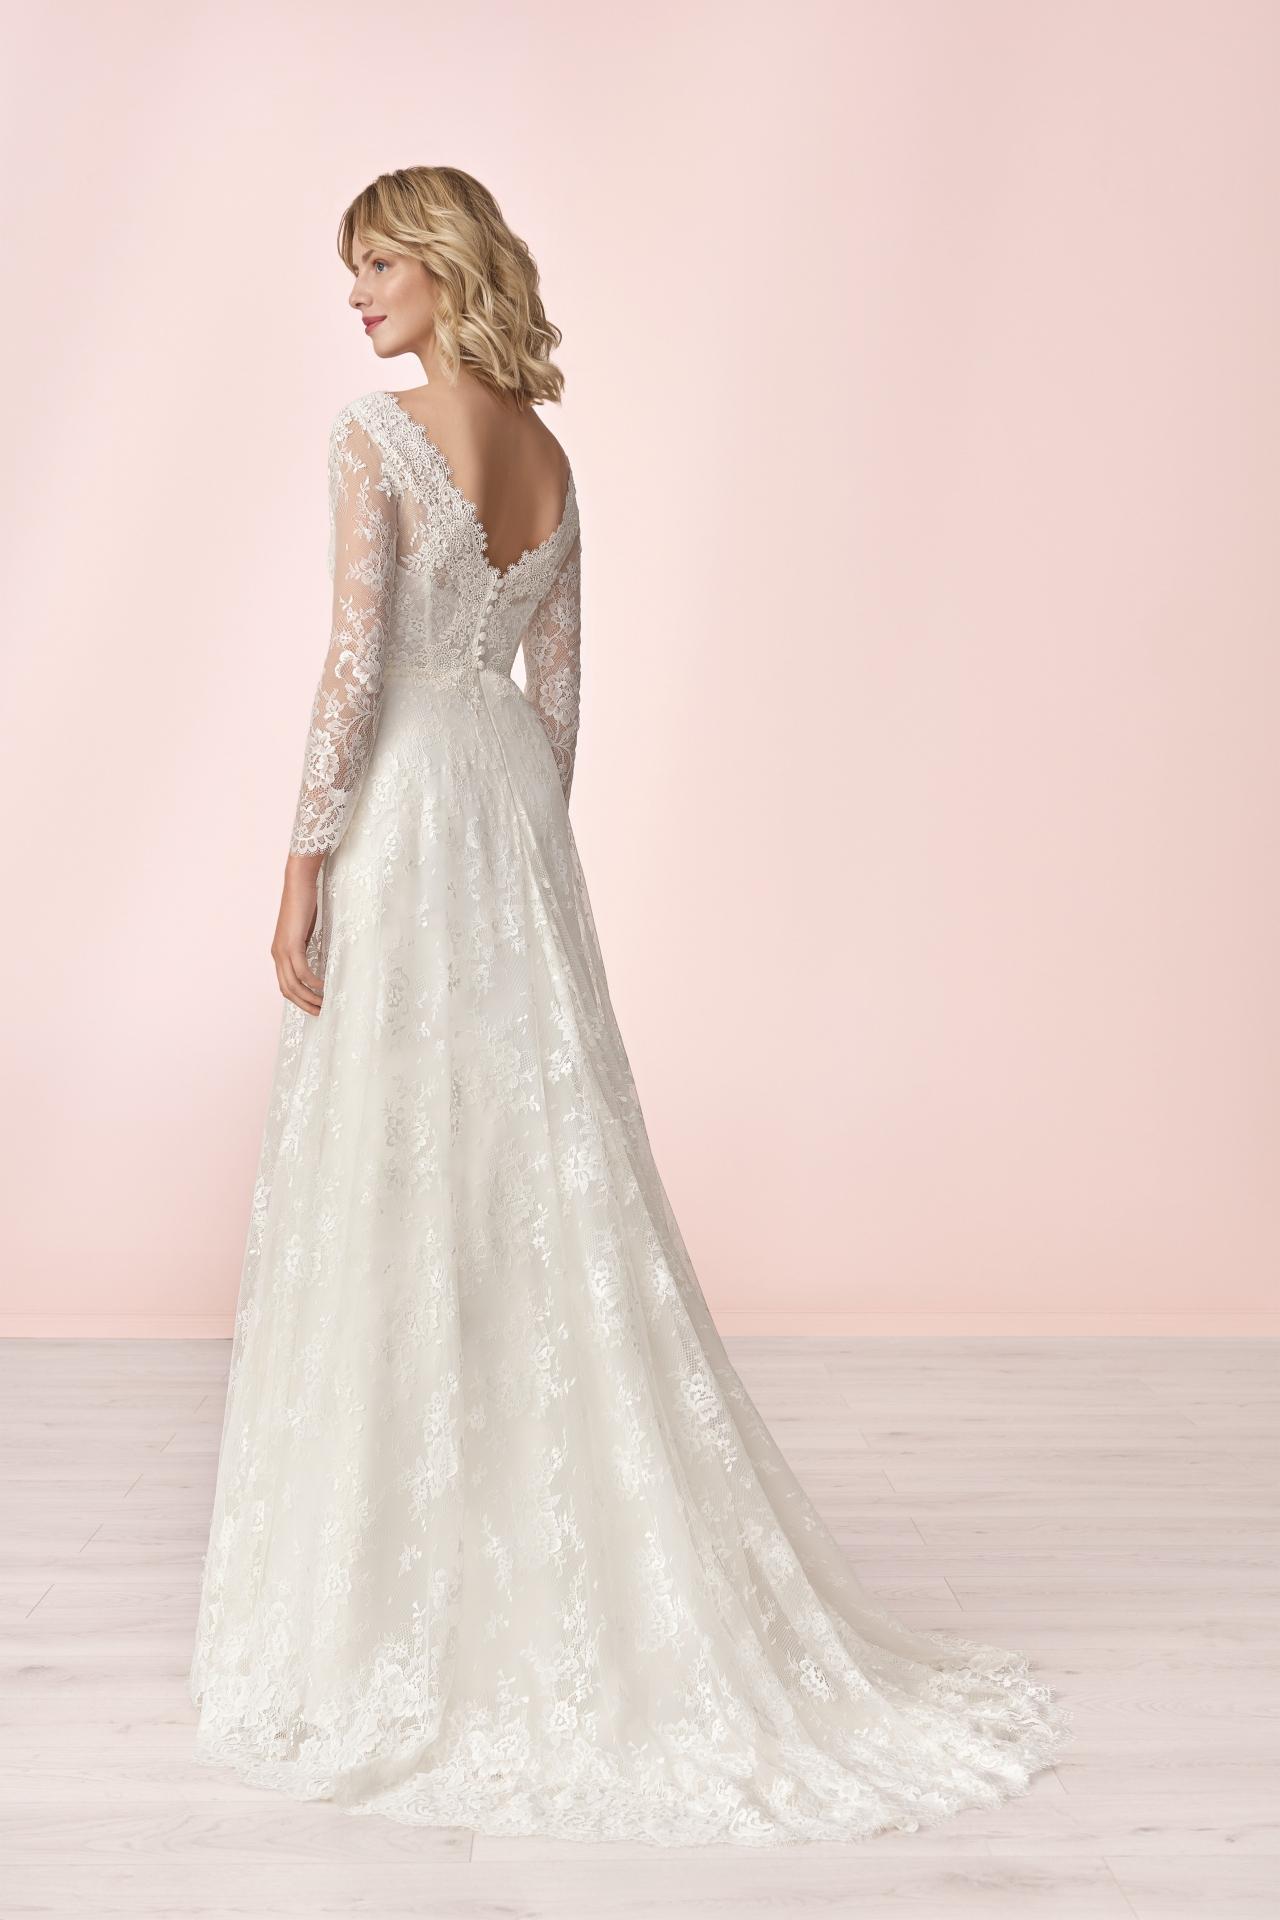 Brautkleid Elizabeth Konin 2019 - 4179T-2